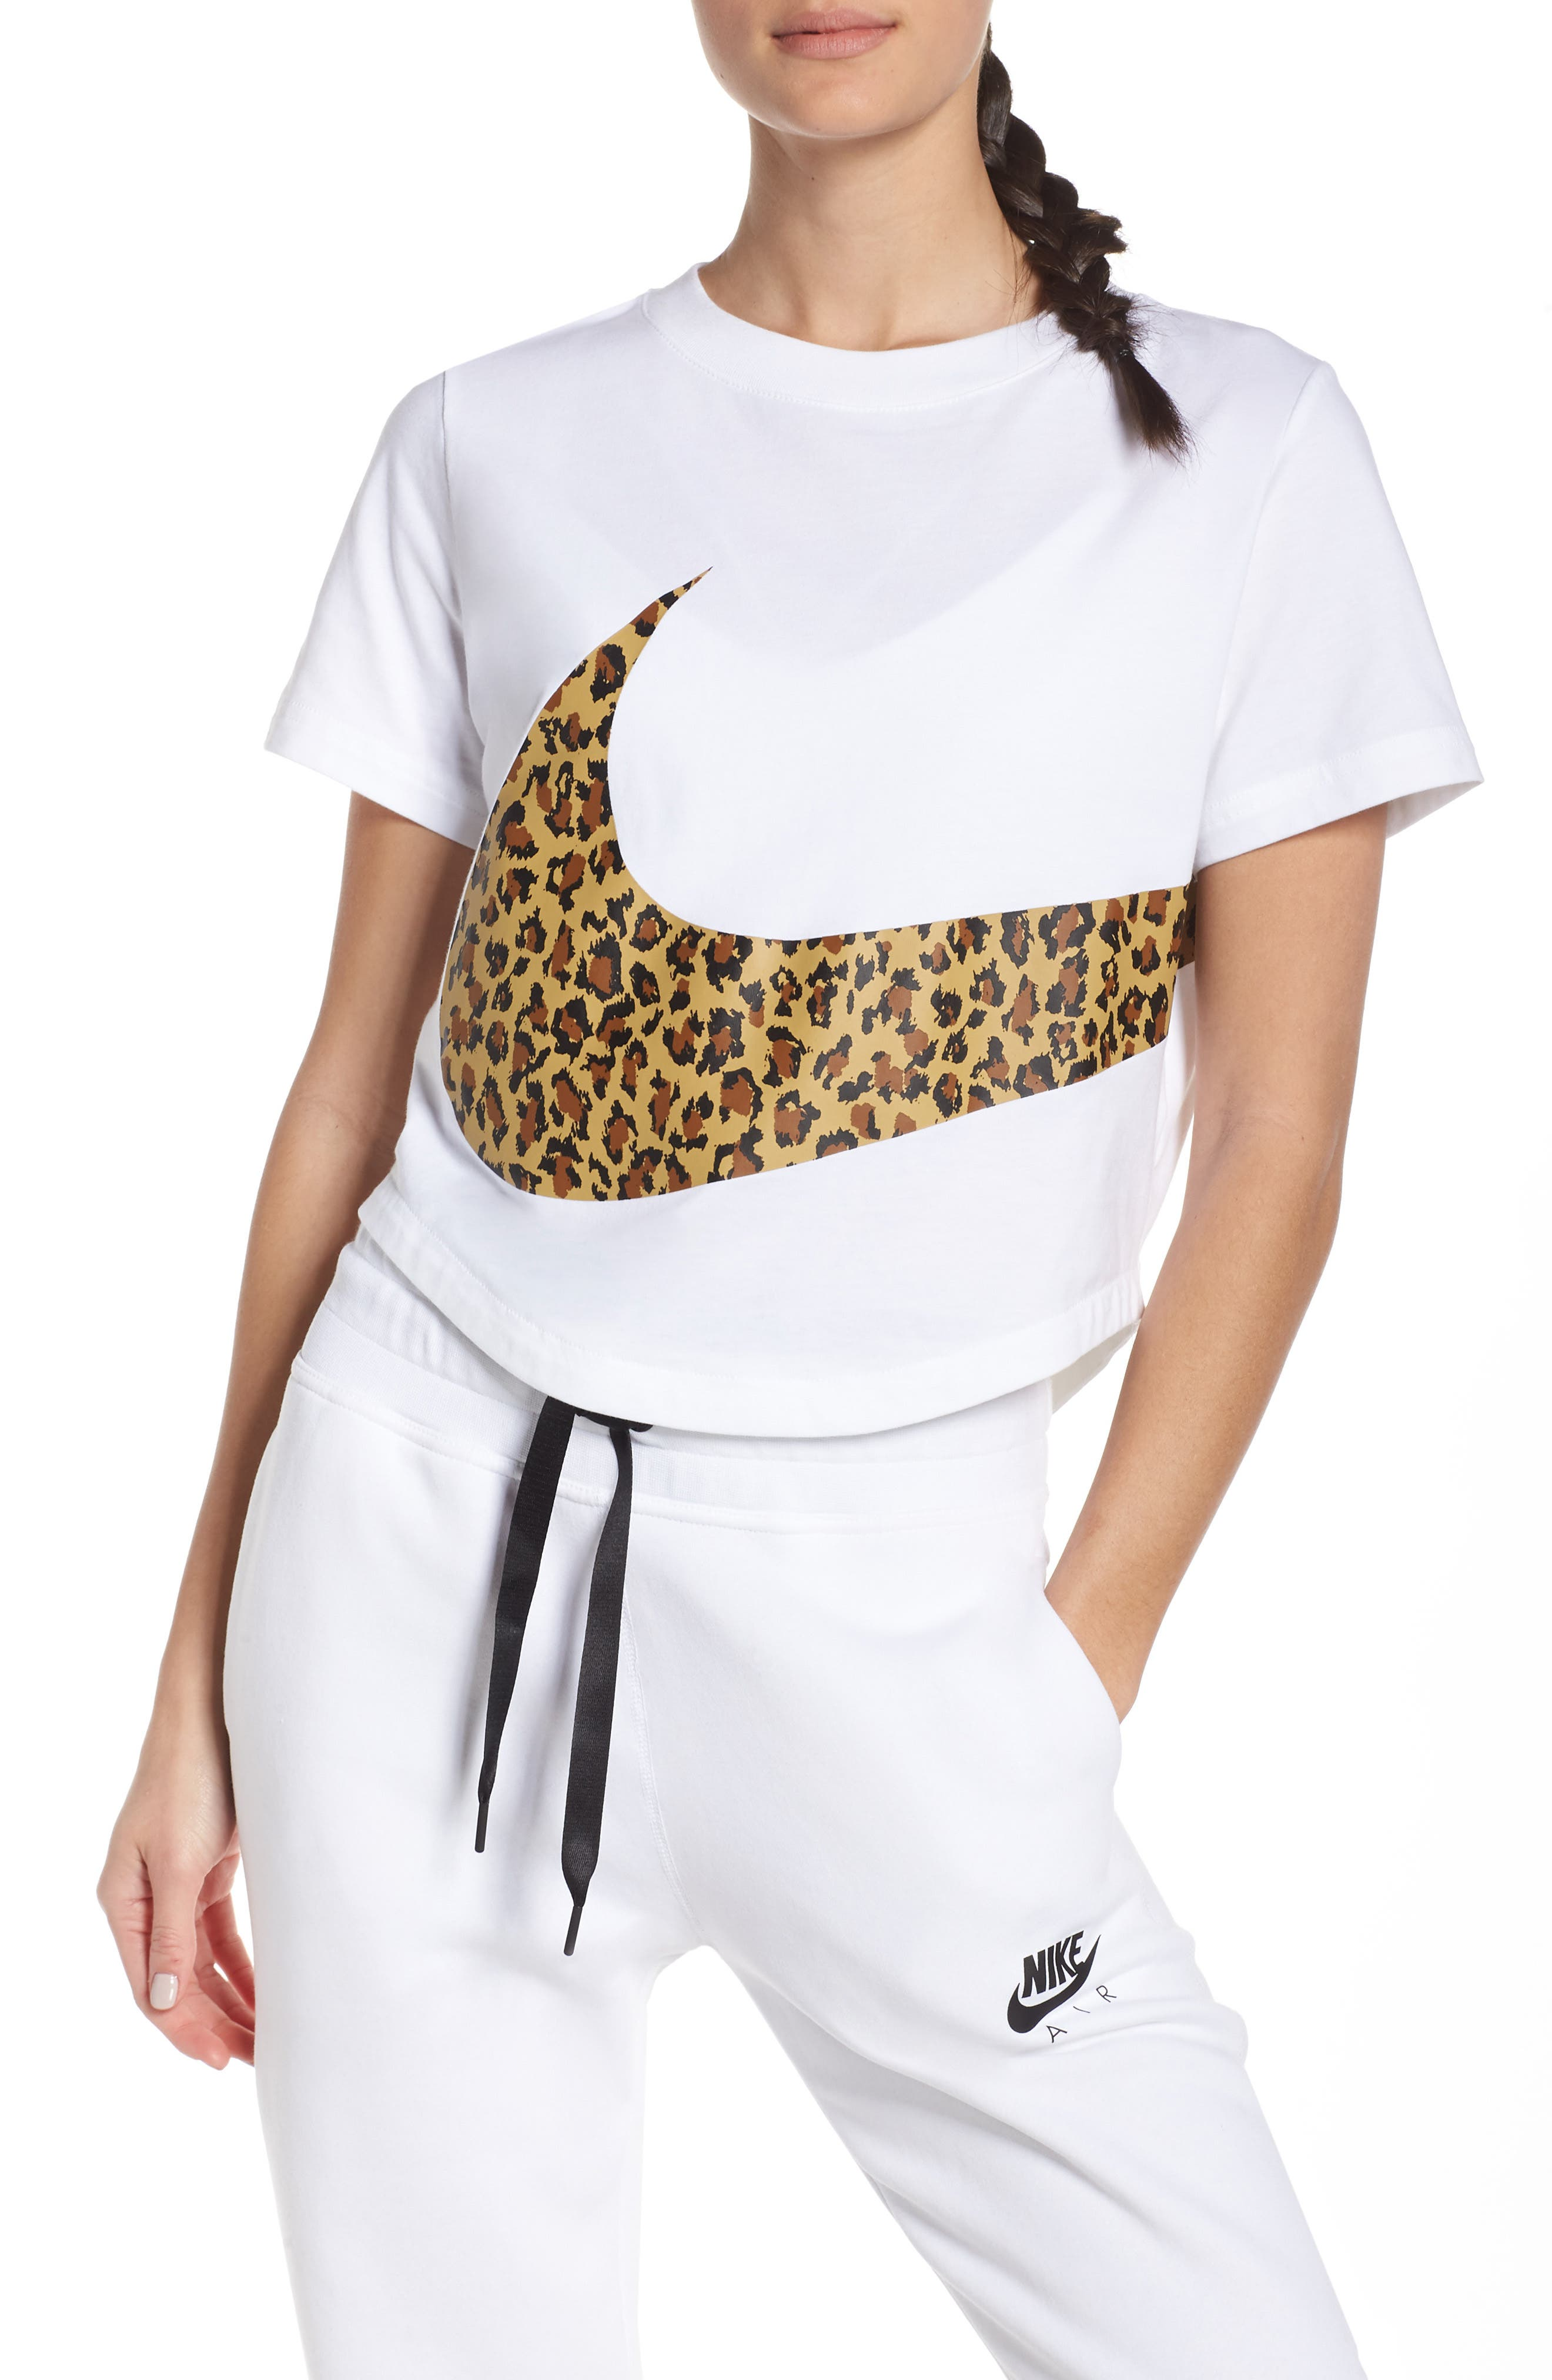 NIKE Sportswear Women's Crop Top, Main, color, WHITE